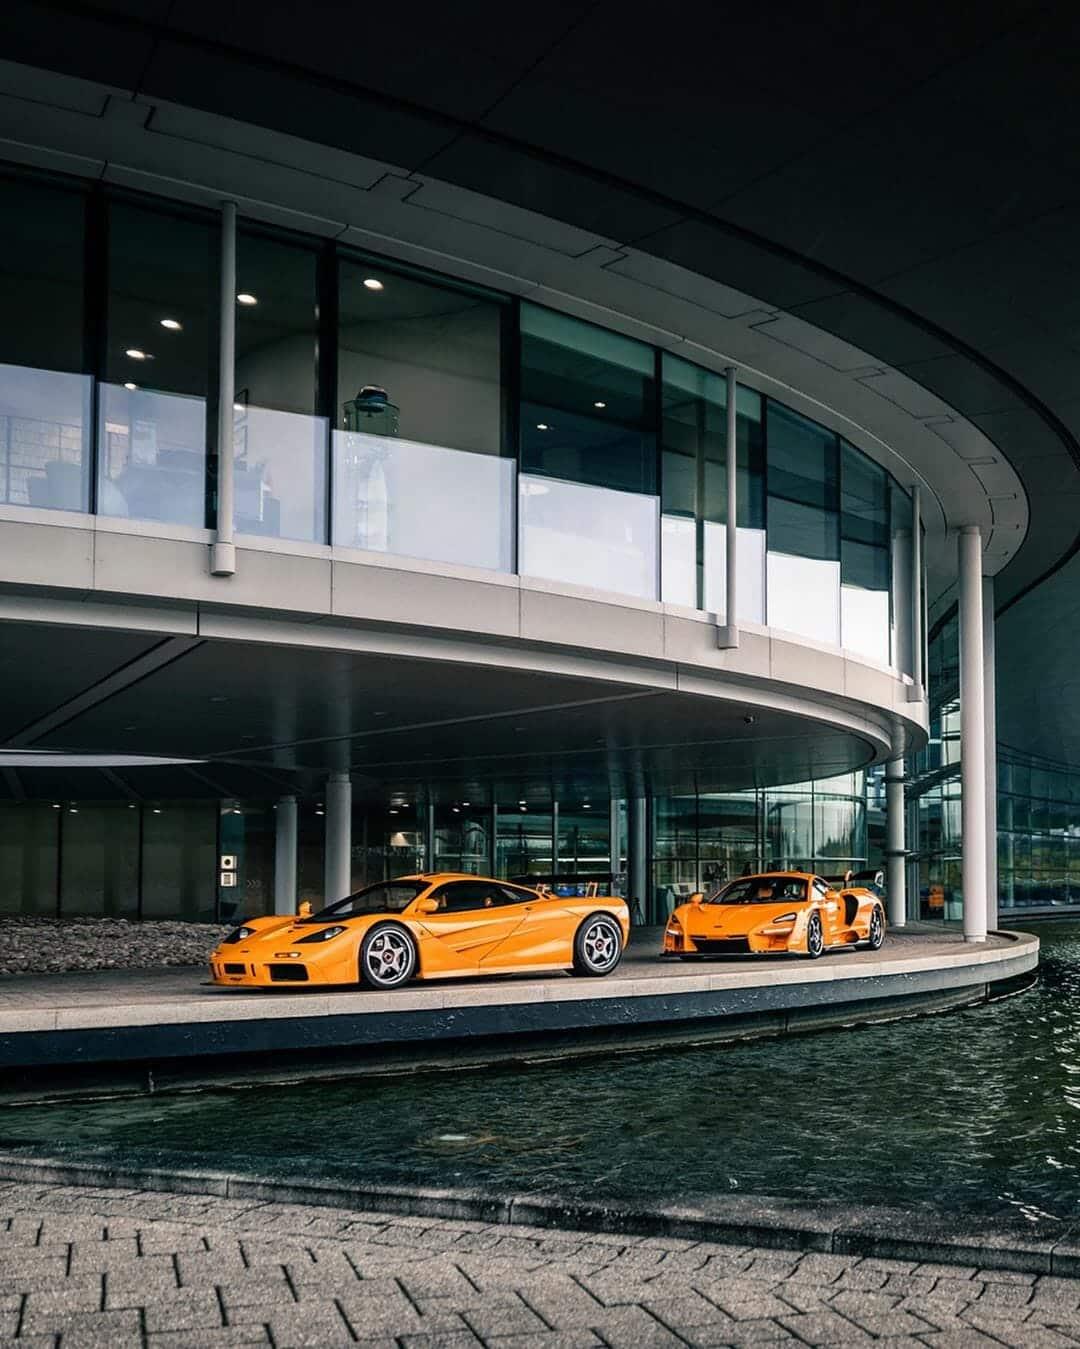 McLaren F1 LM & McLaren Senna - Image 14